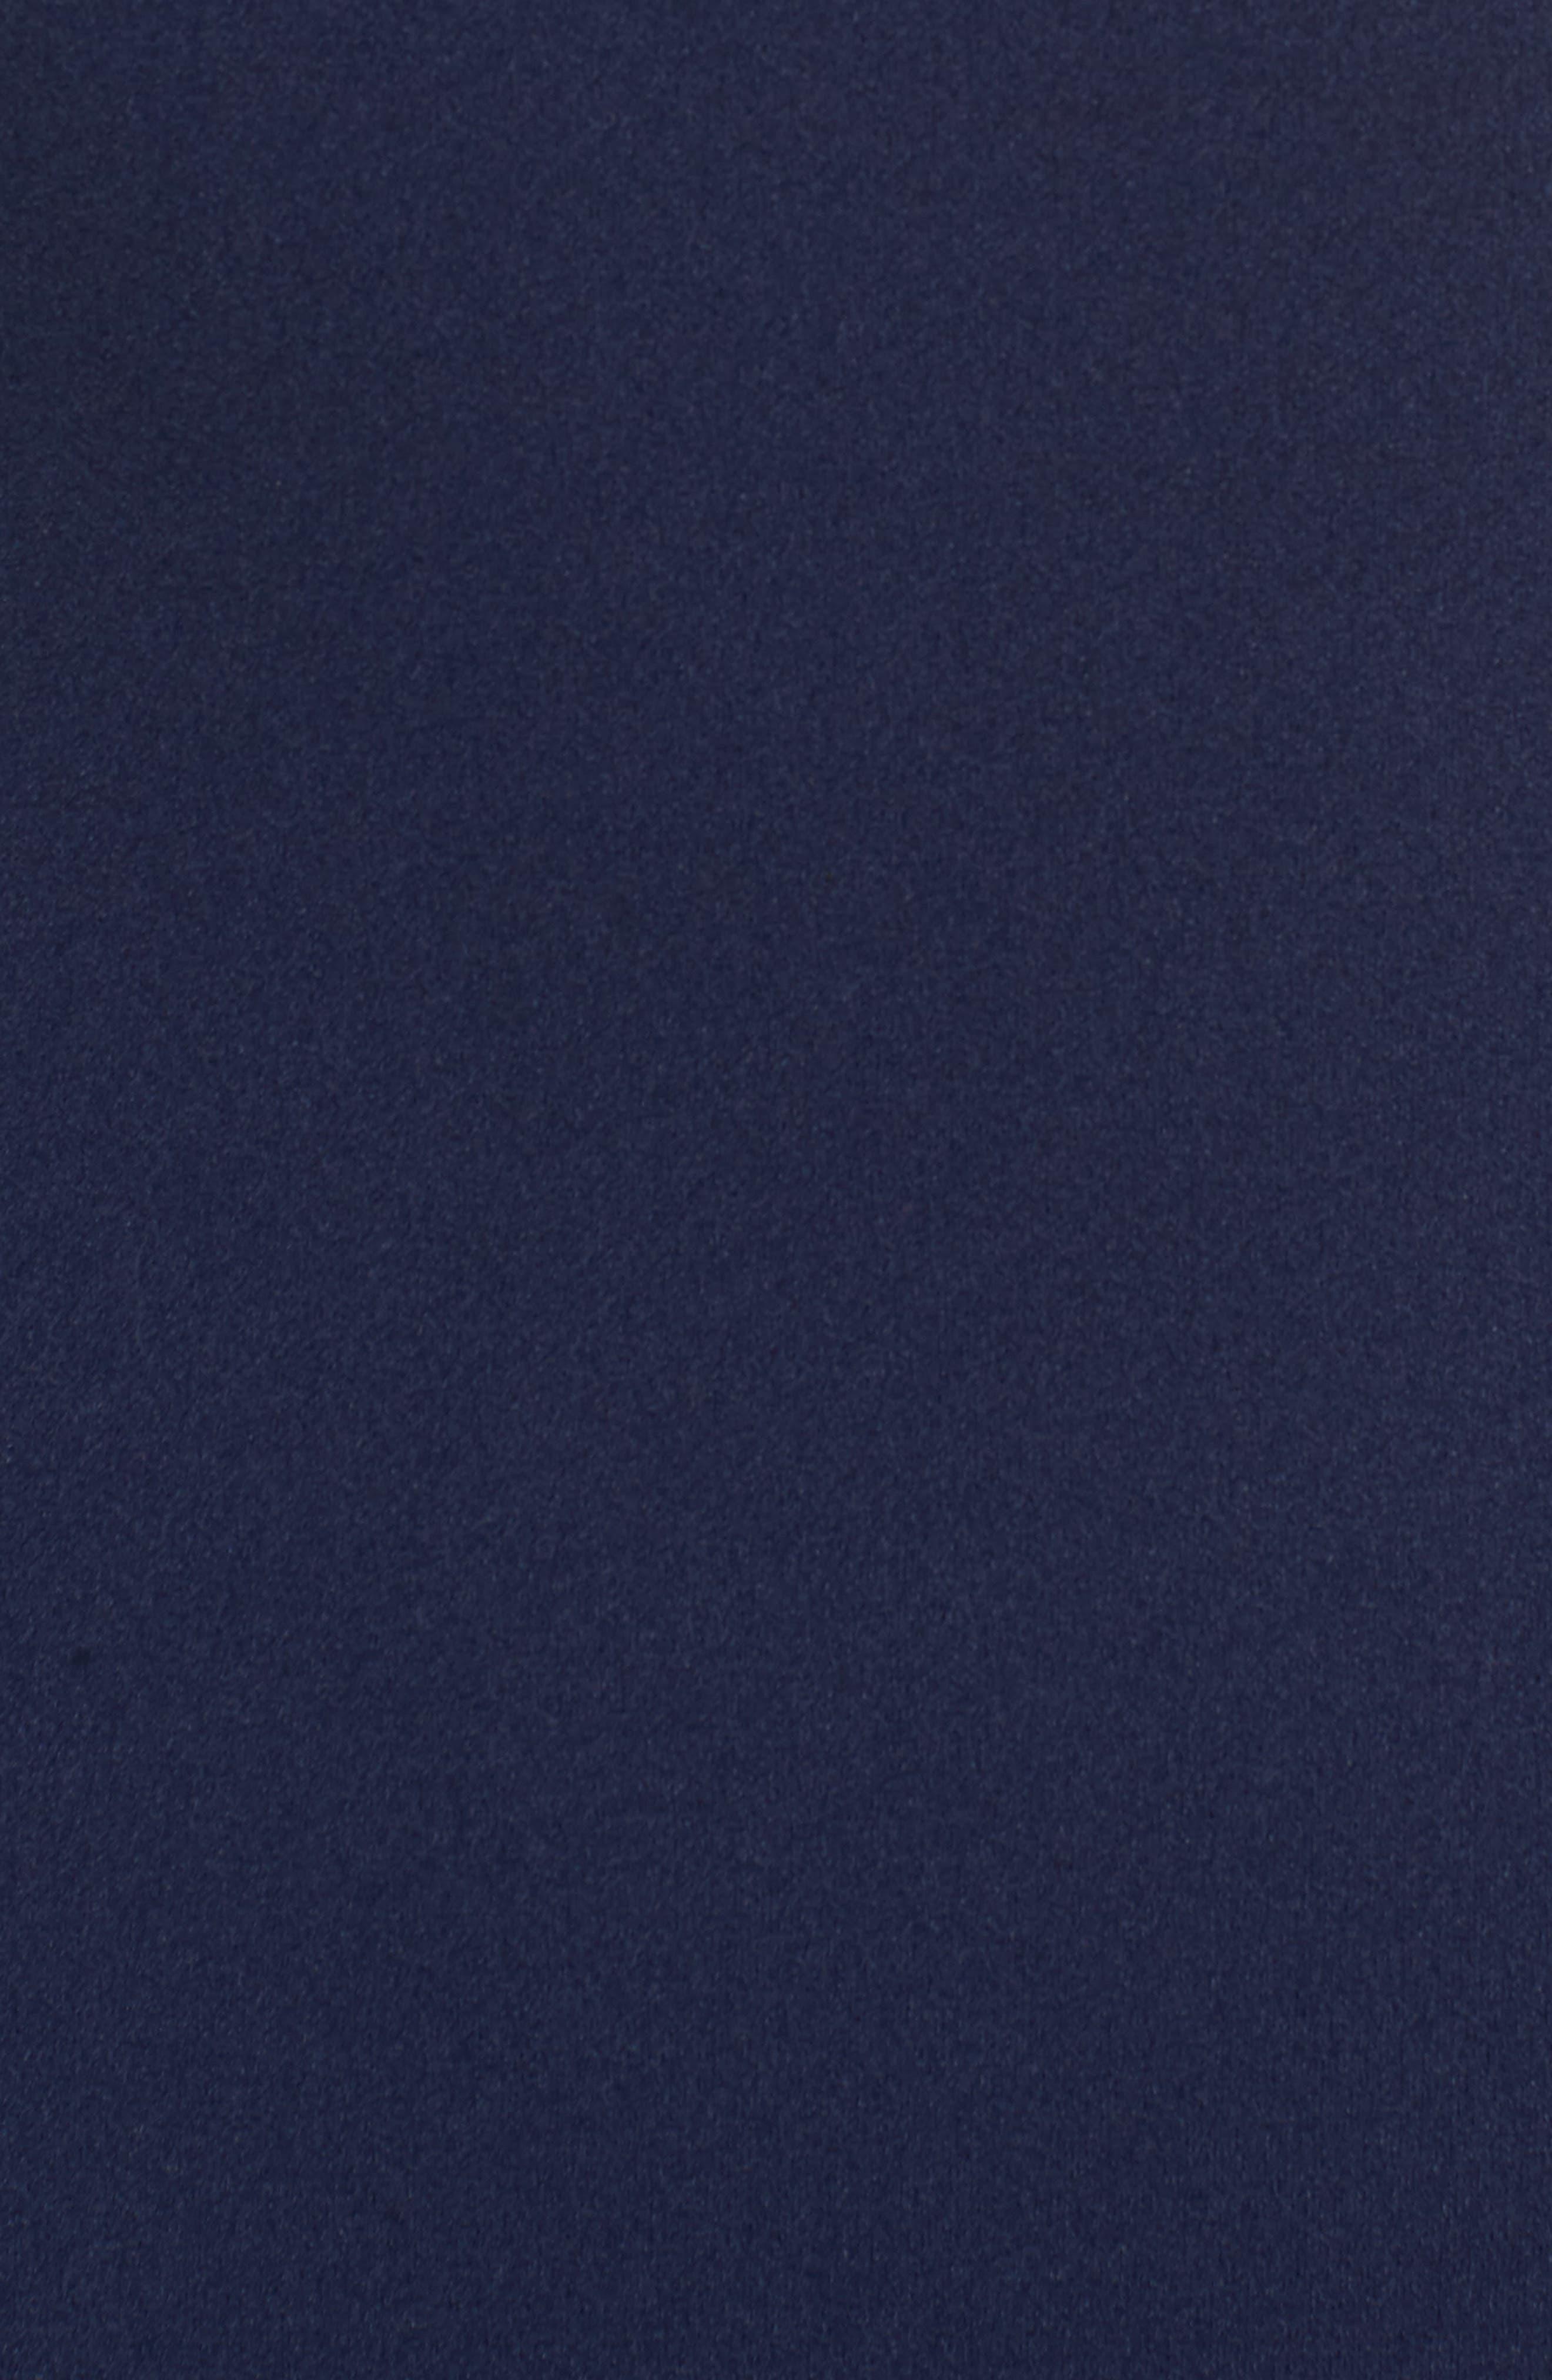 Open Back Sheath Dress,                             Alternate thumbnail 5, color,                             Navy